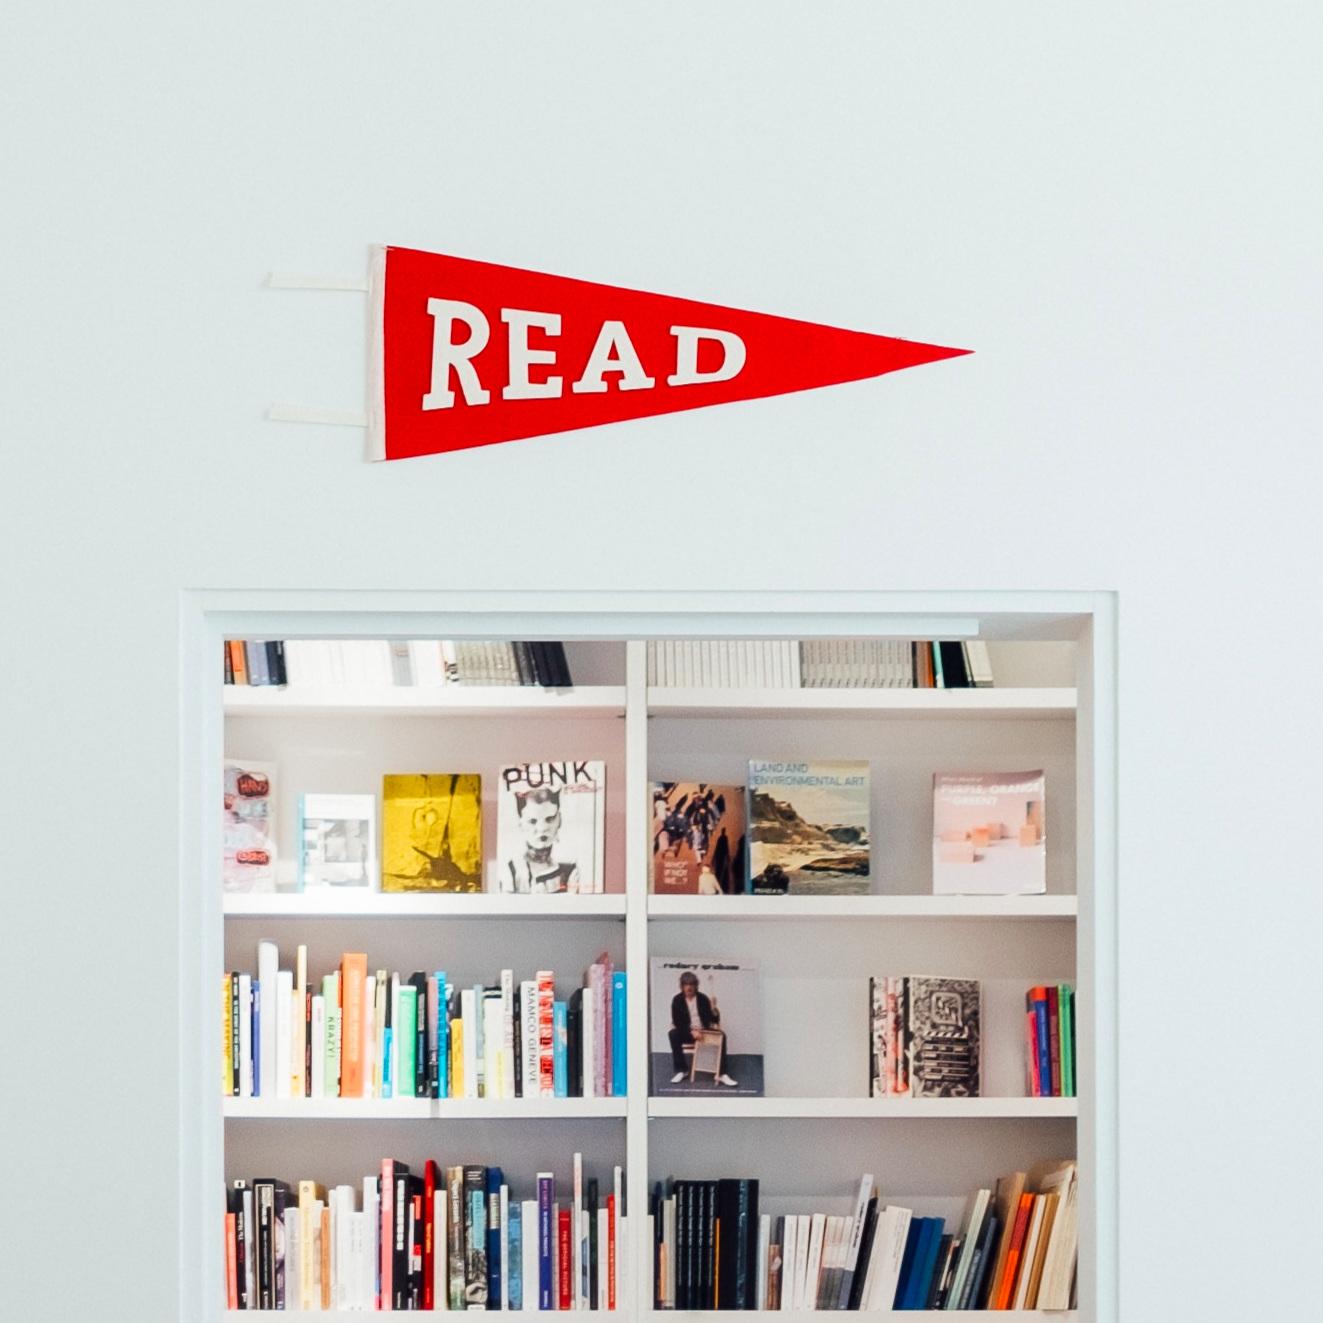 Read+Pennant+and+Bookshelf.jpg